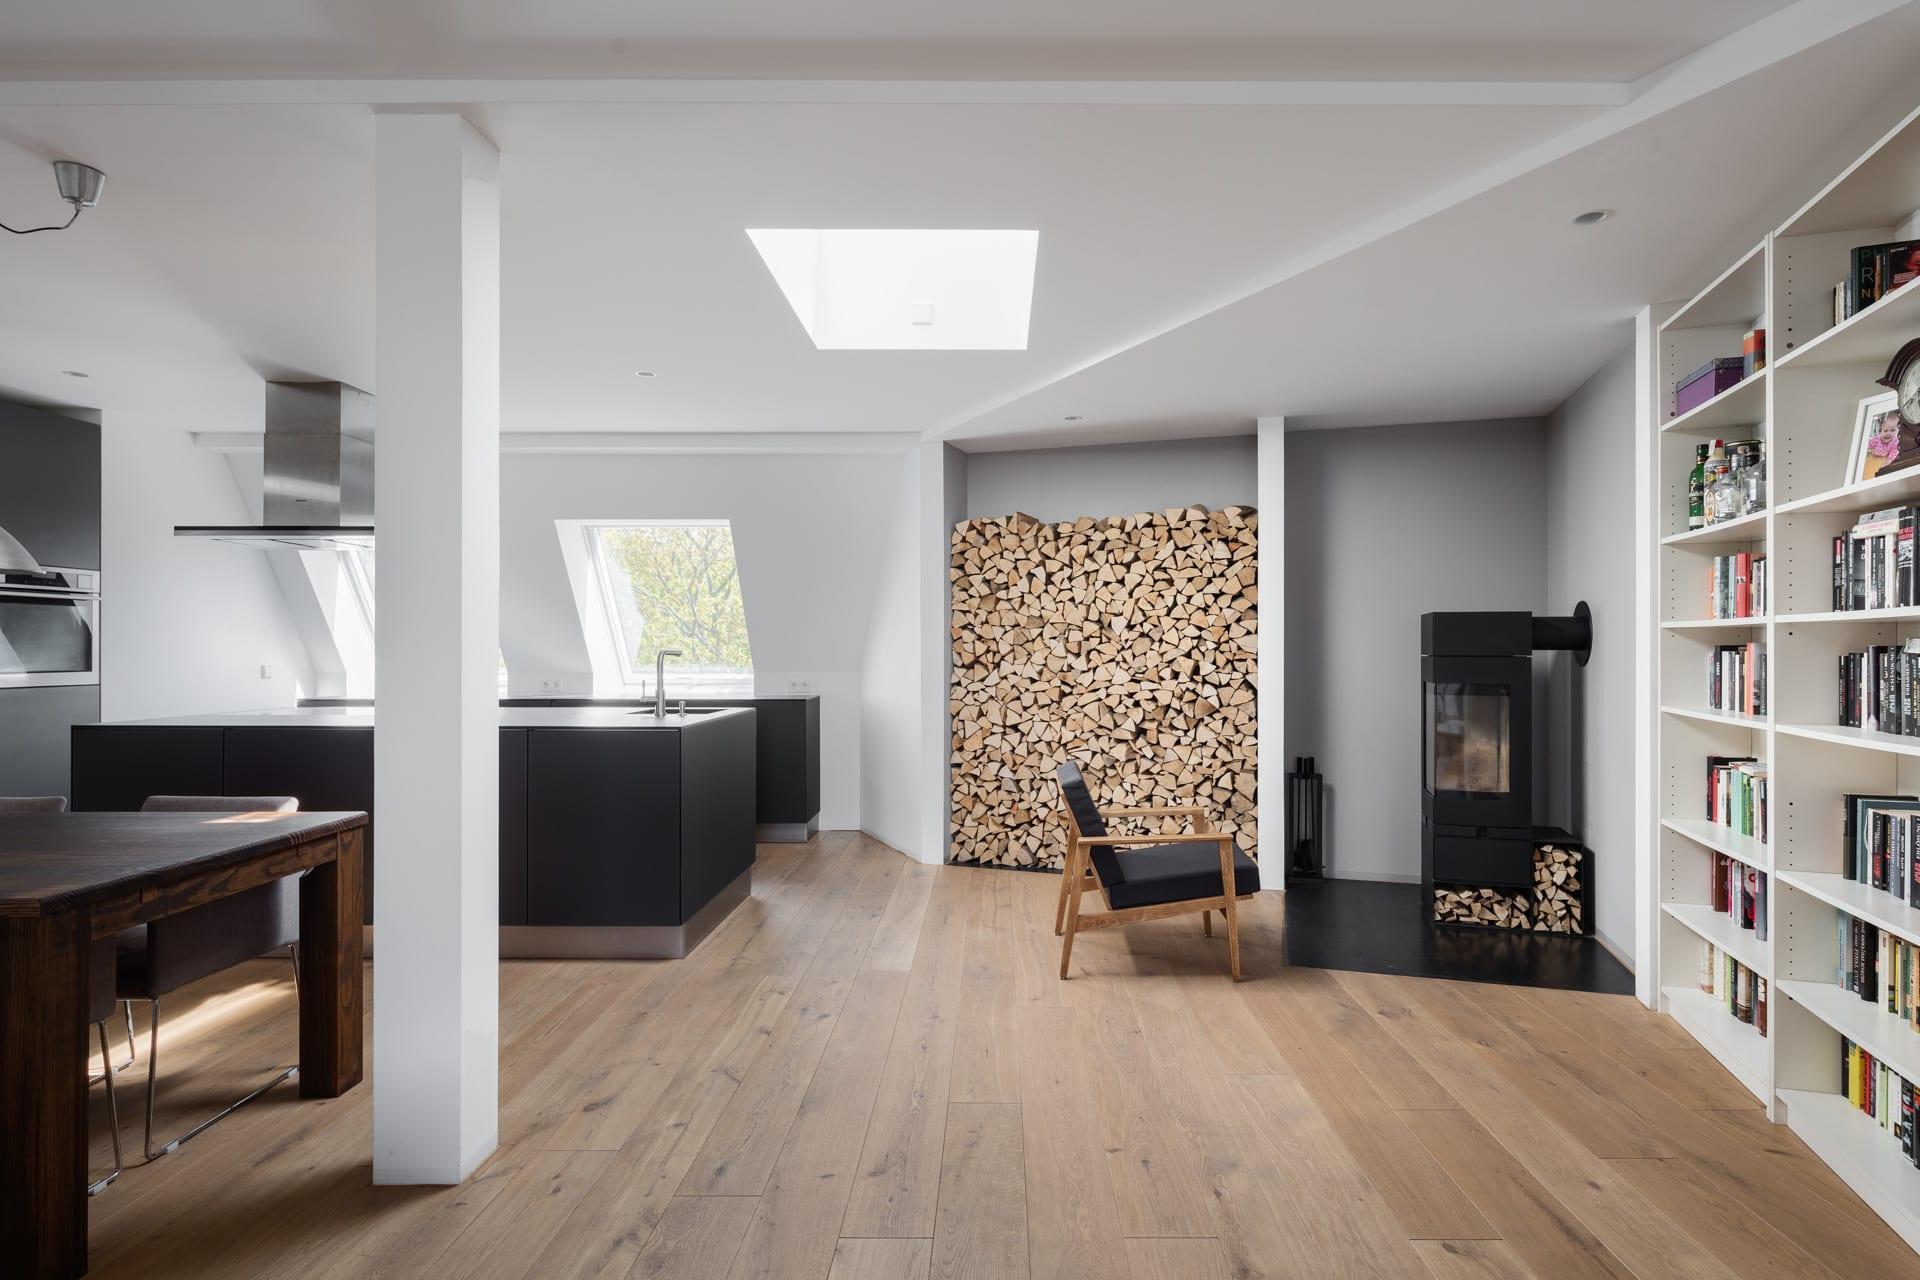 Enjoyable Robert Beyer Architekten Klemens Renner Apartment R Beutiful Home Inspiration Cosmmahrainfo